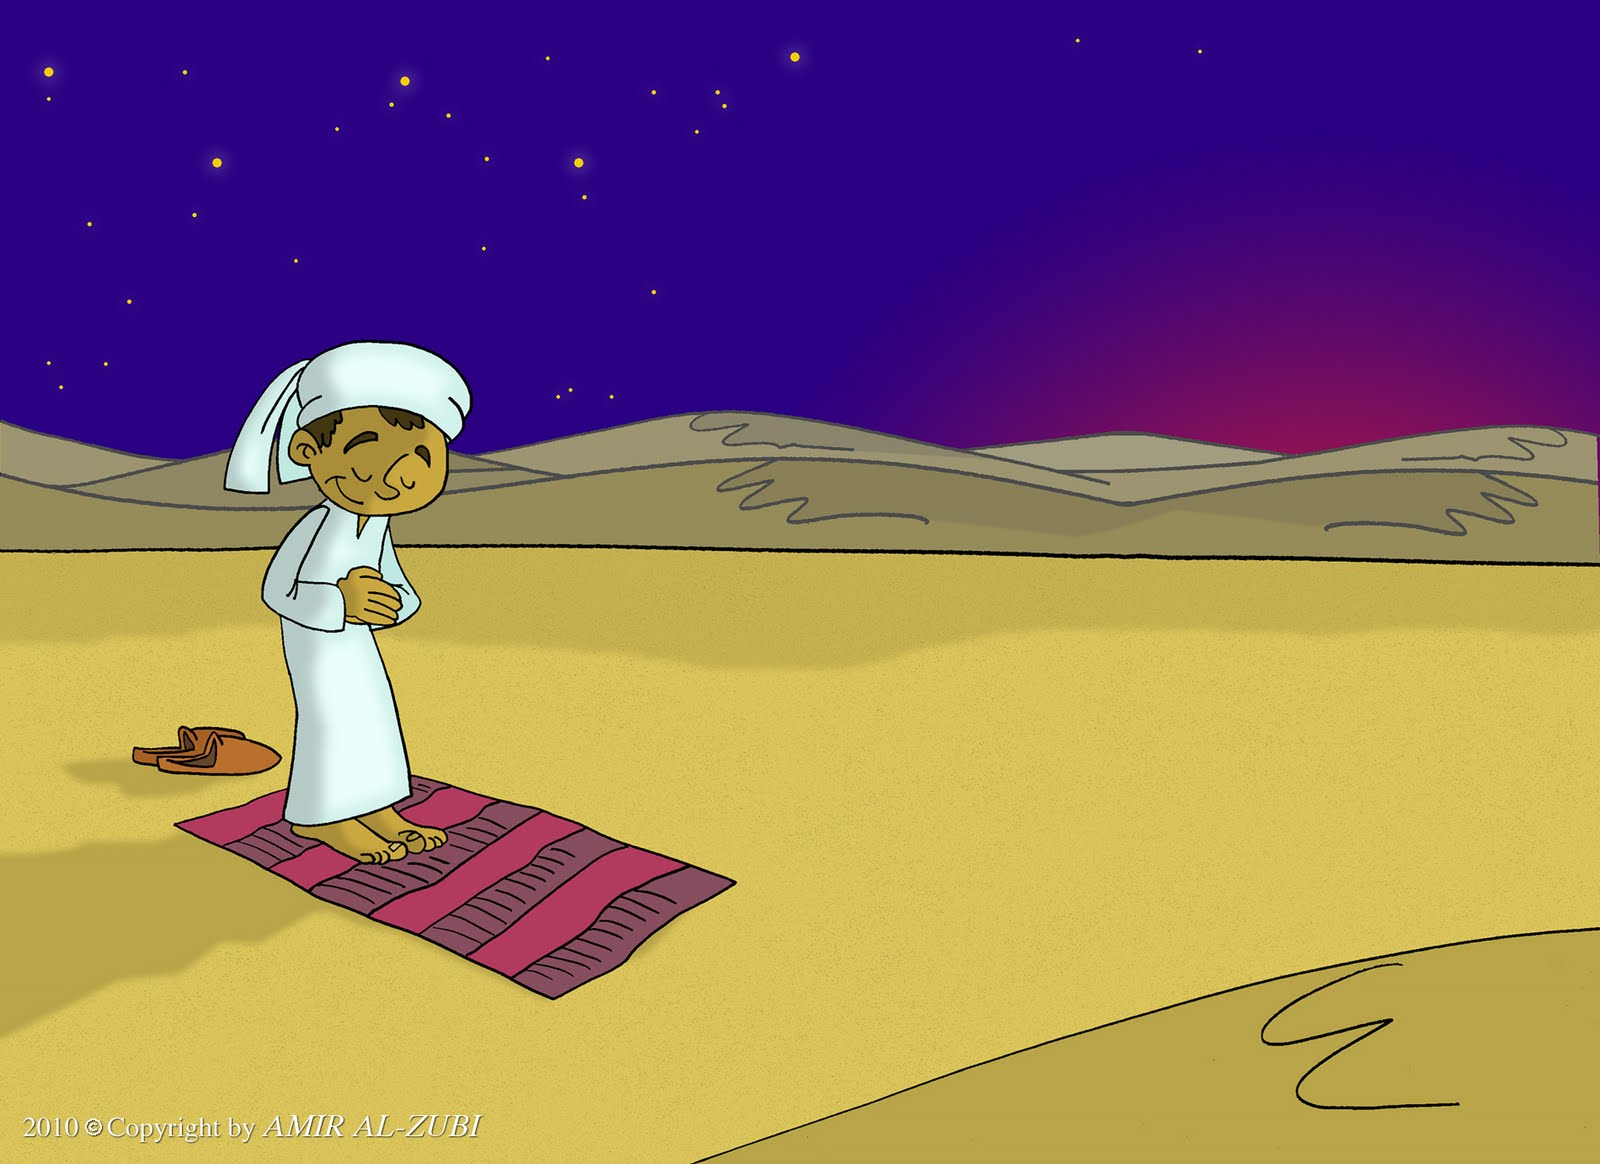 muslim cartoon wallpaper - photo #27